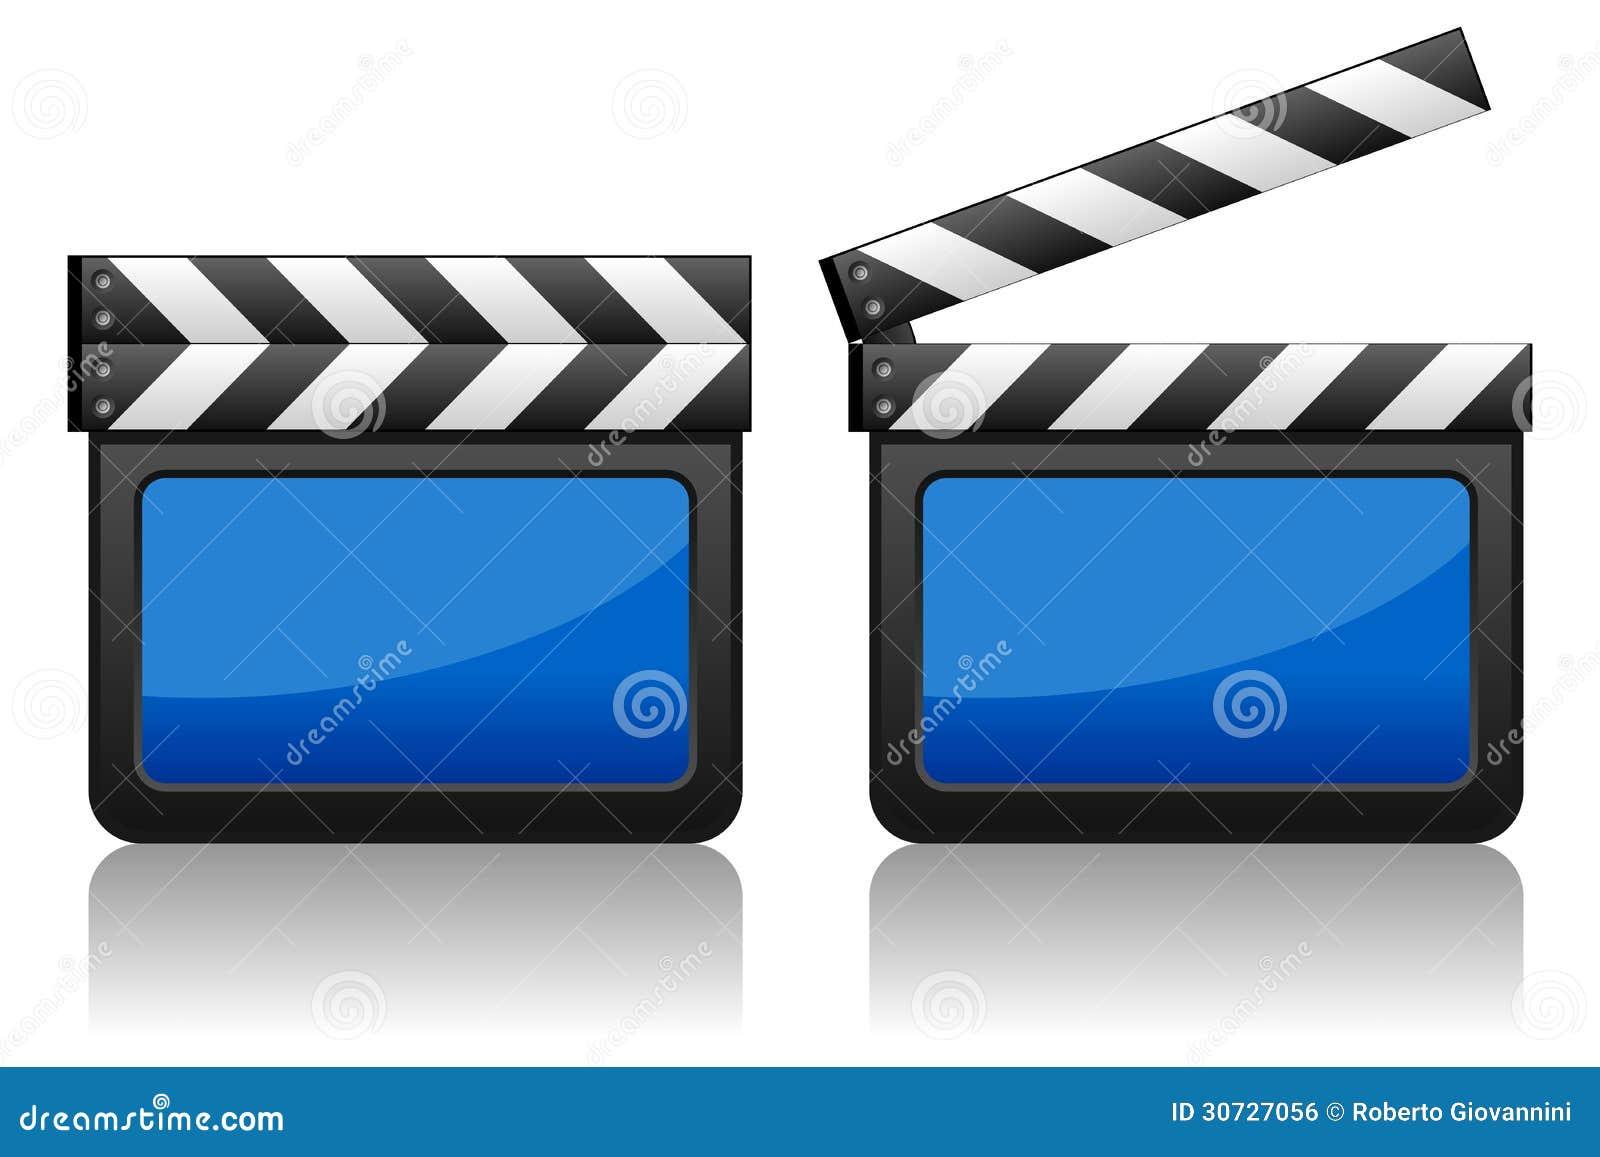 Sexy open blue film-1592